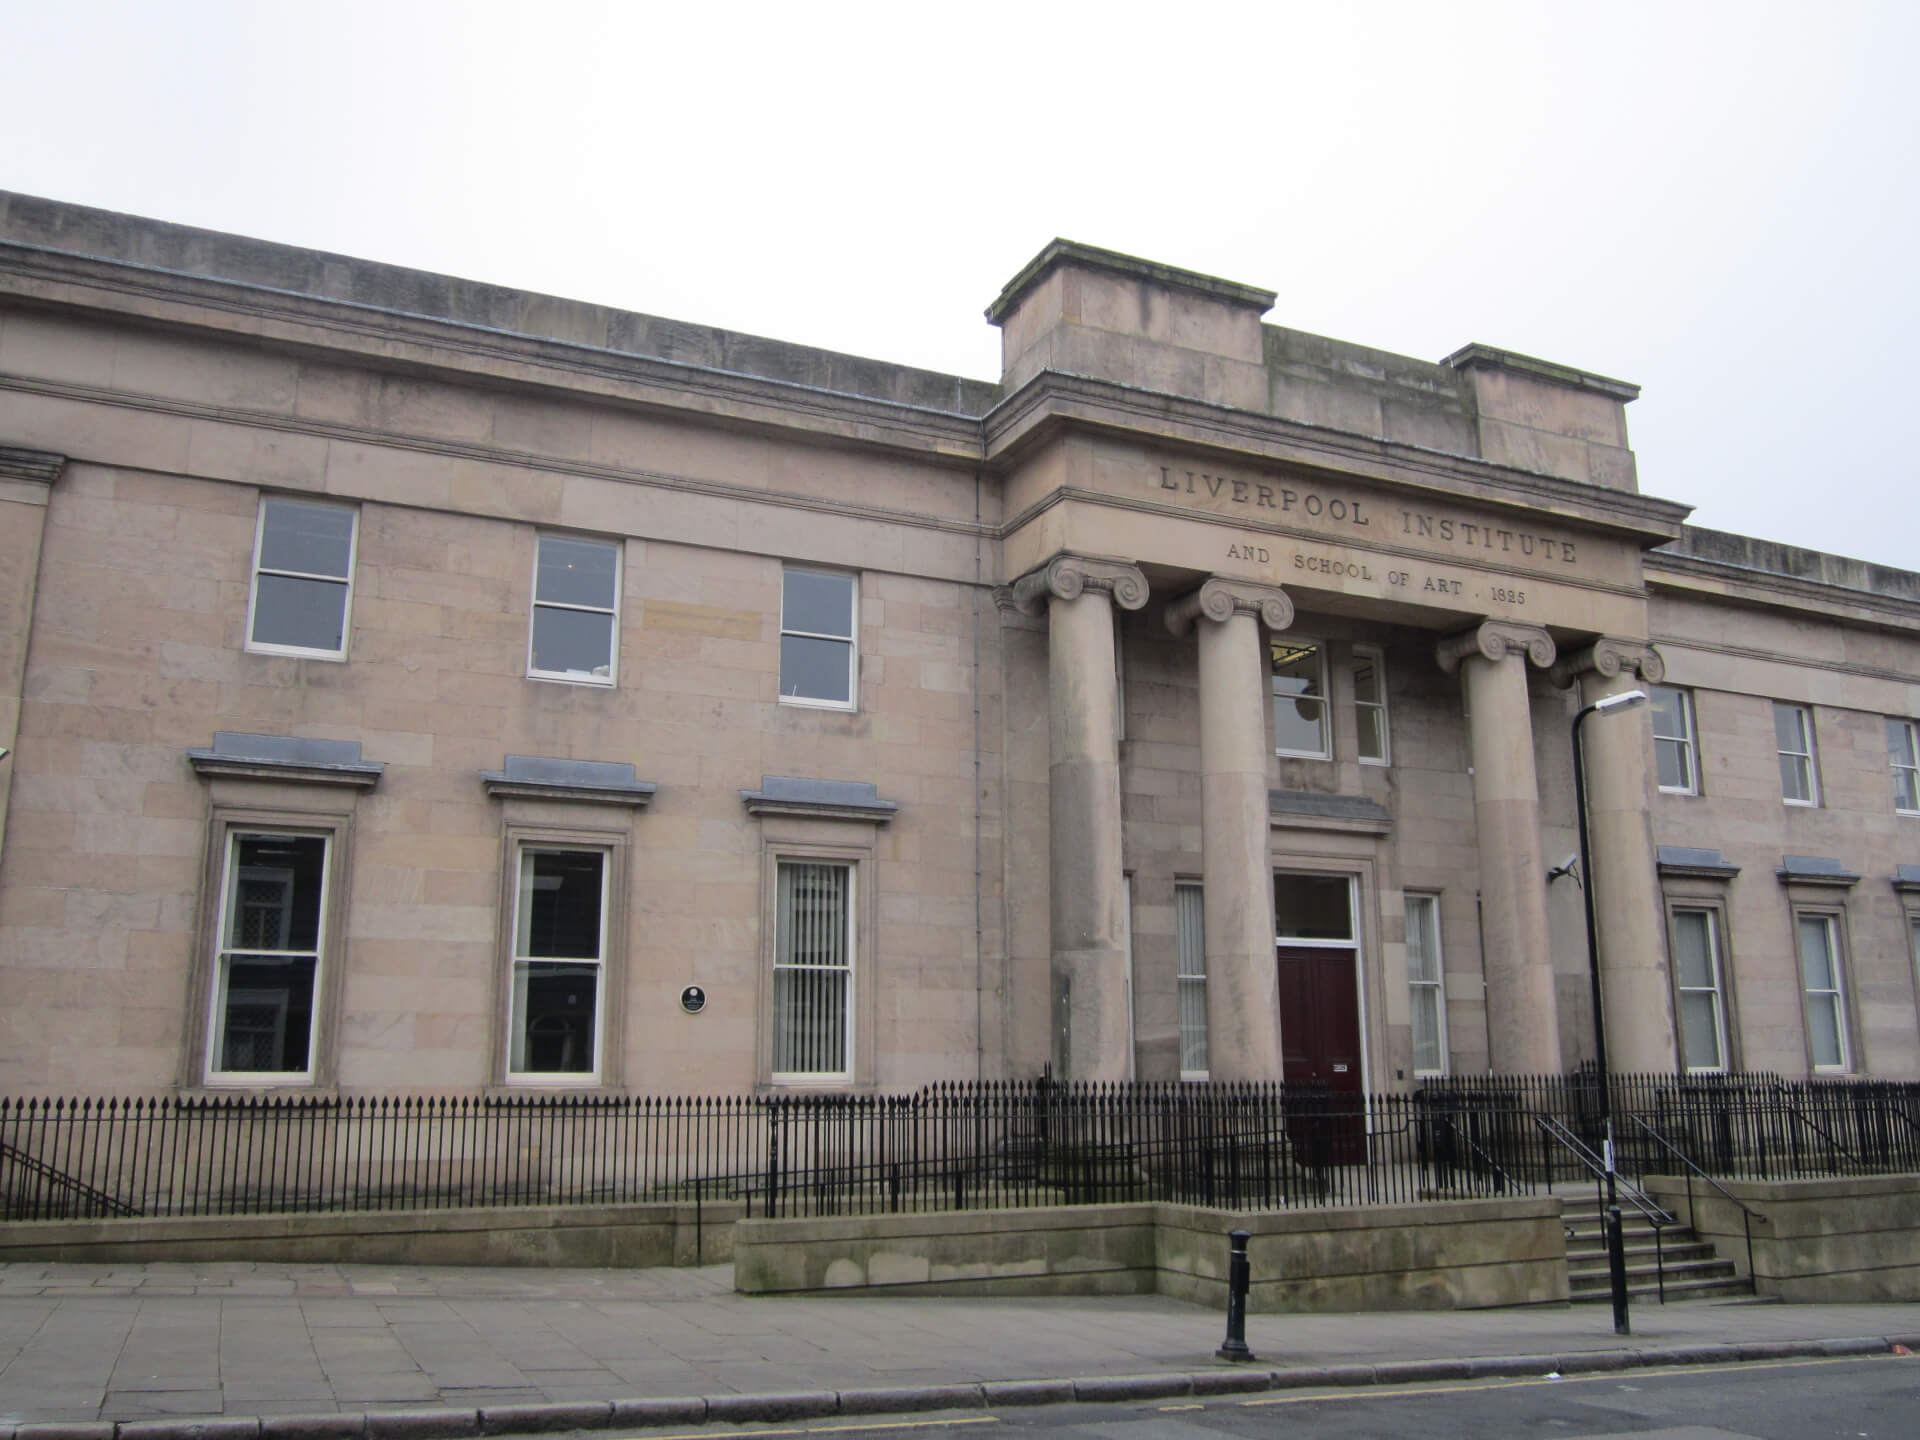 Liverpool_Institute,_Mount_Street_(4)